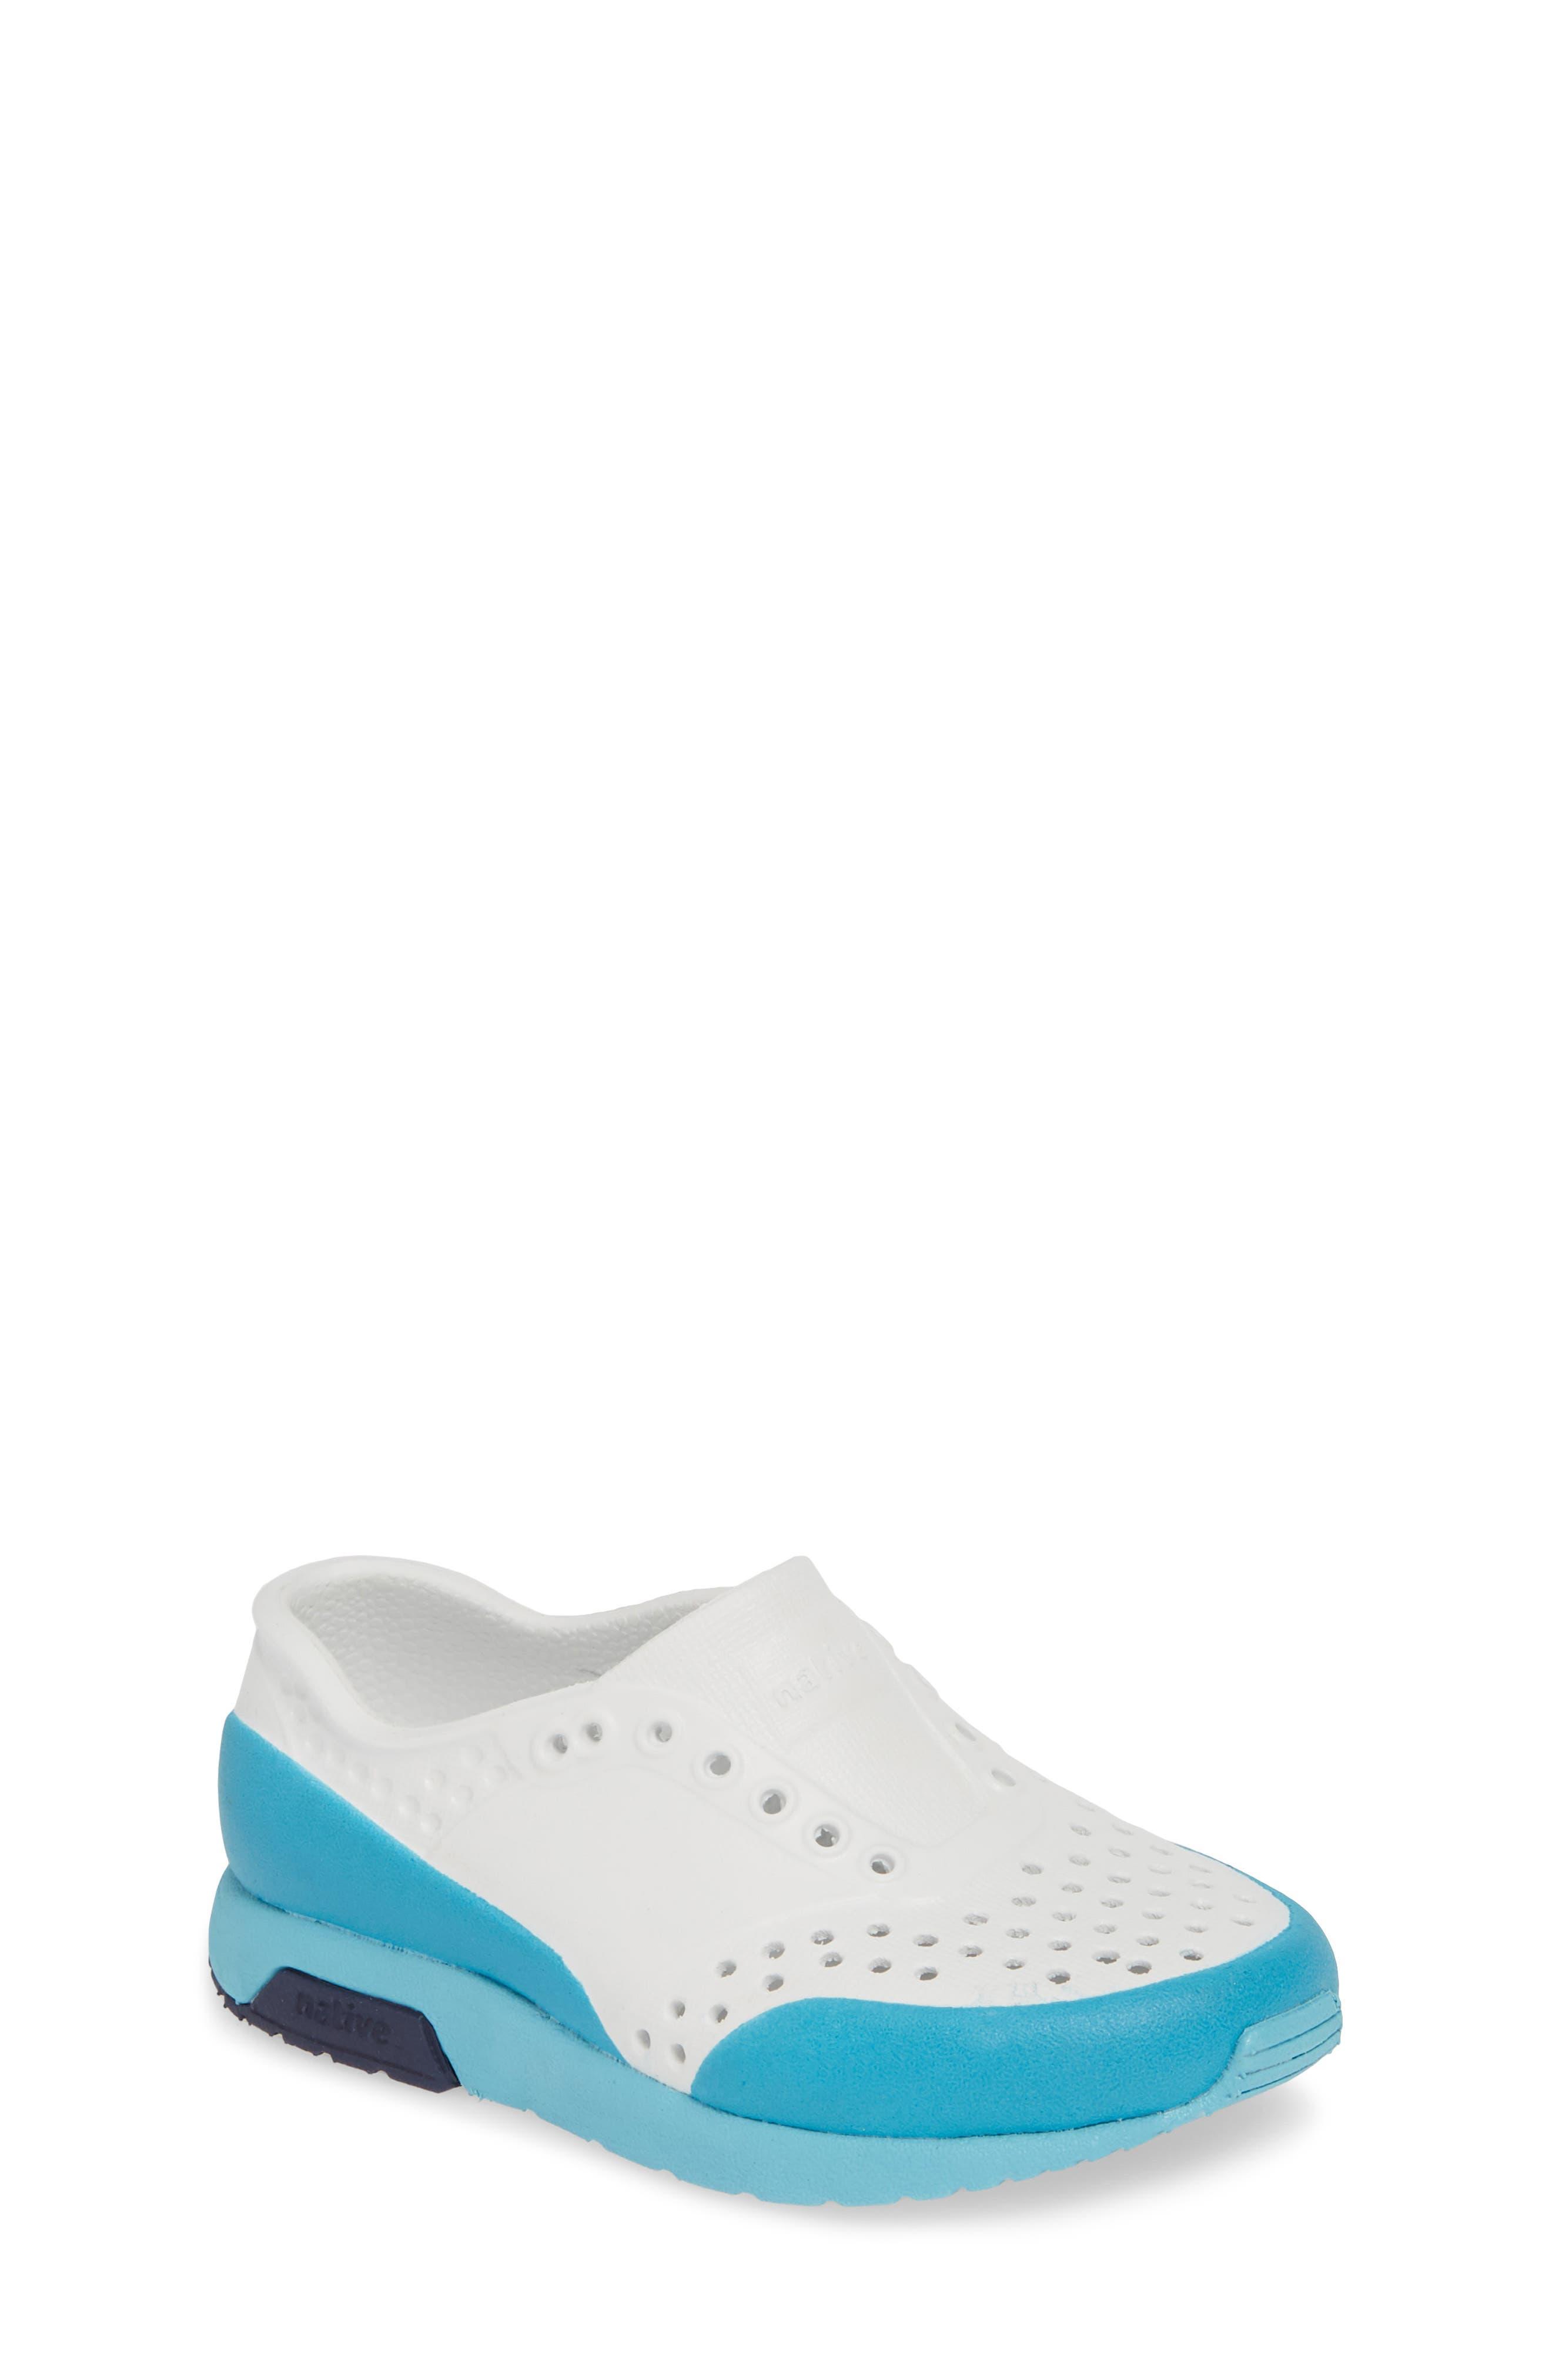 NATIVE SHOES Lennox Block Slip-On Sneaker, Main, color, 438